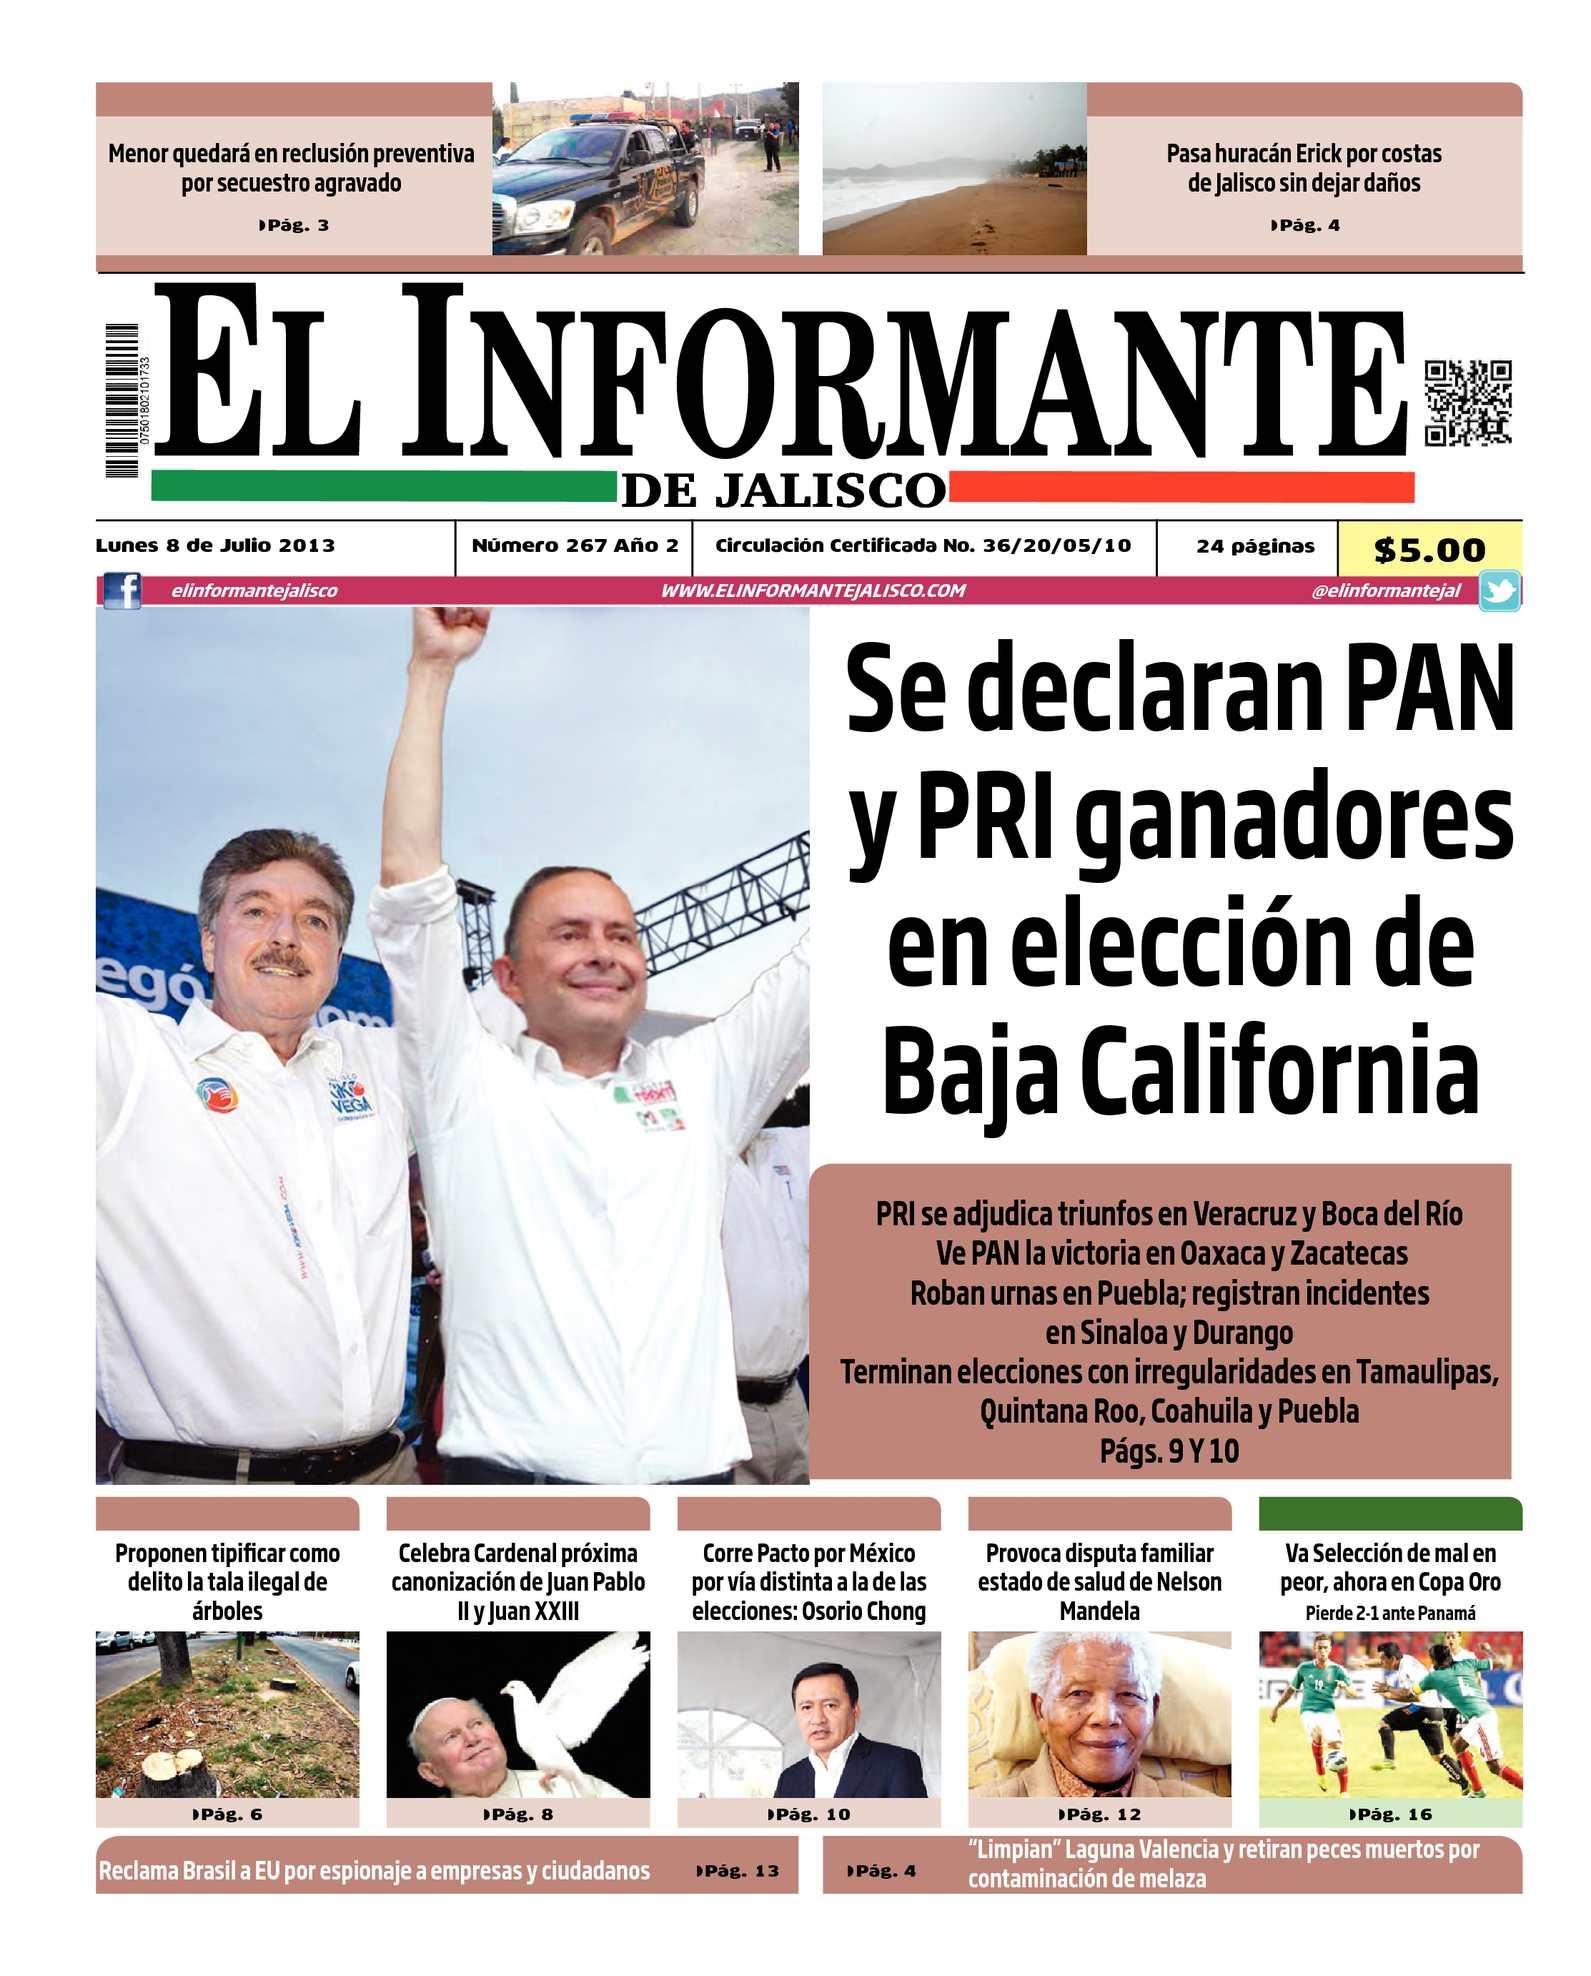 Calaméo - El Informante 8 de julio 2013 e2c2a44a43815